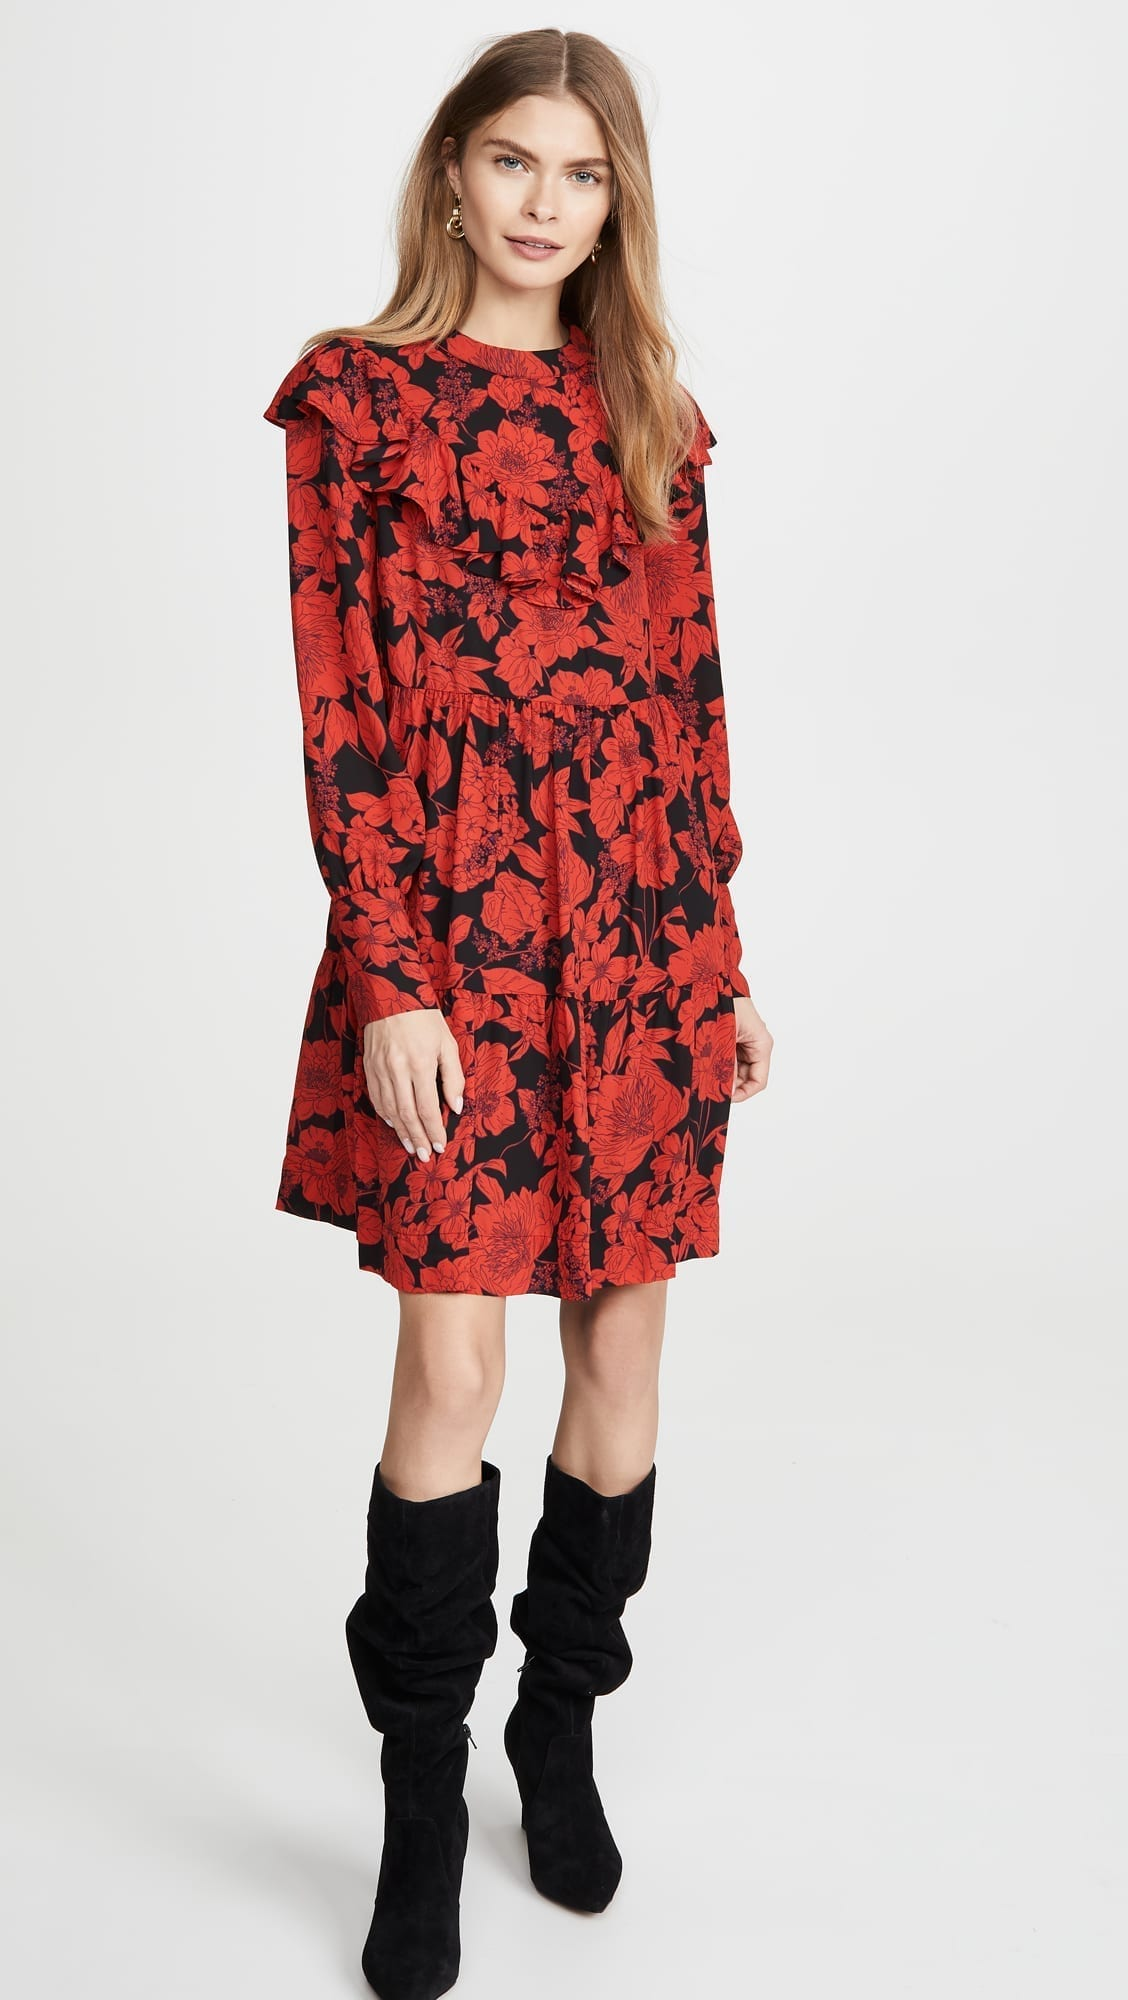 REBECCA MINKOFF Margaret Dress